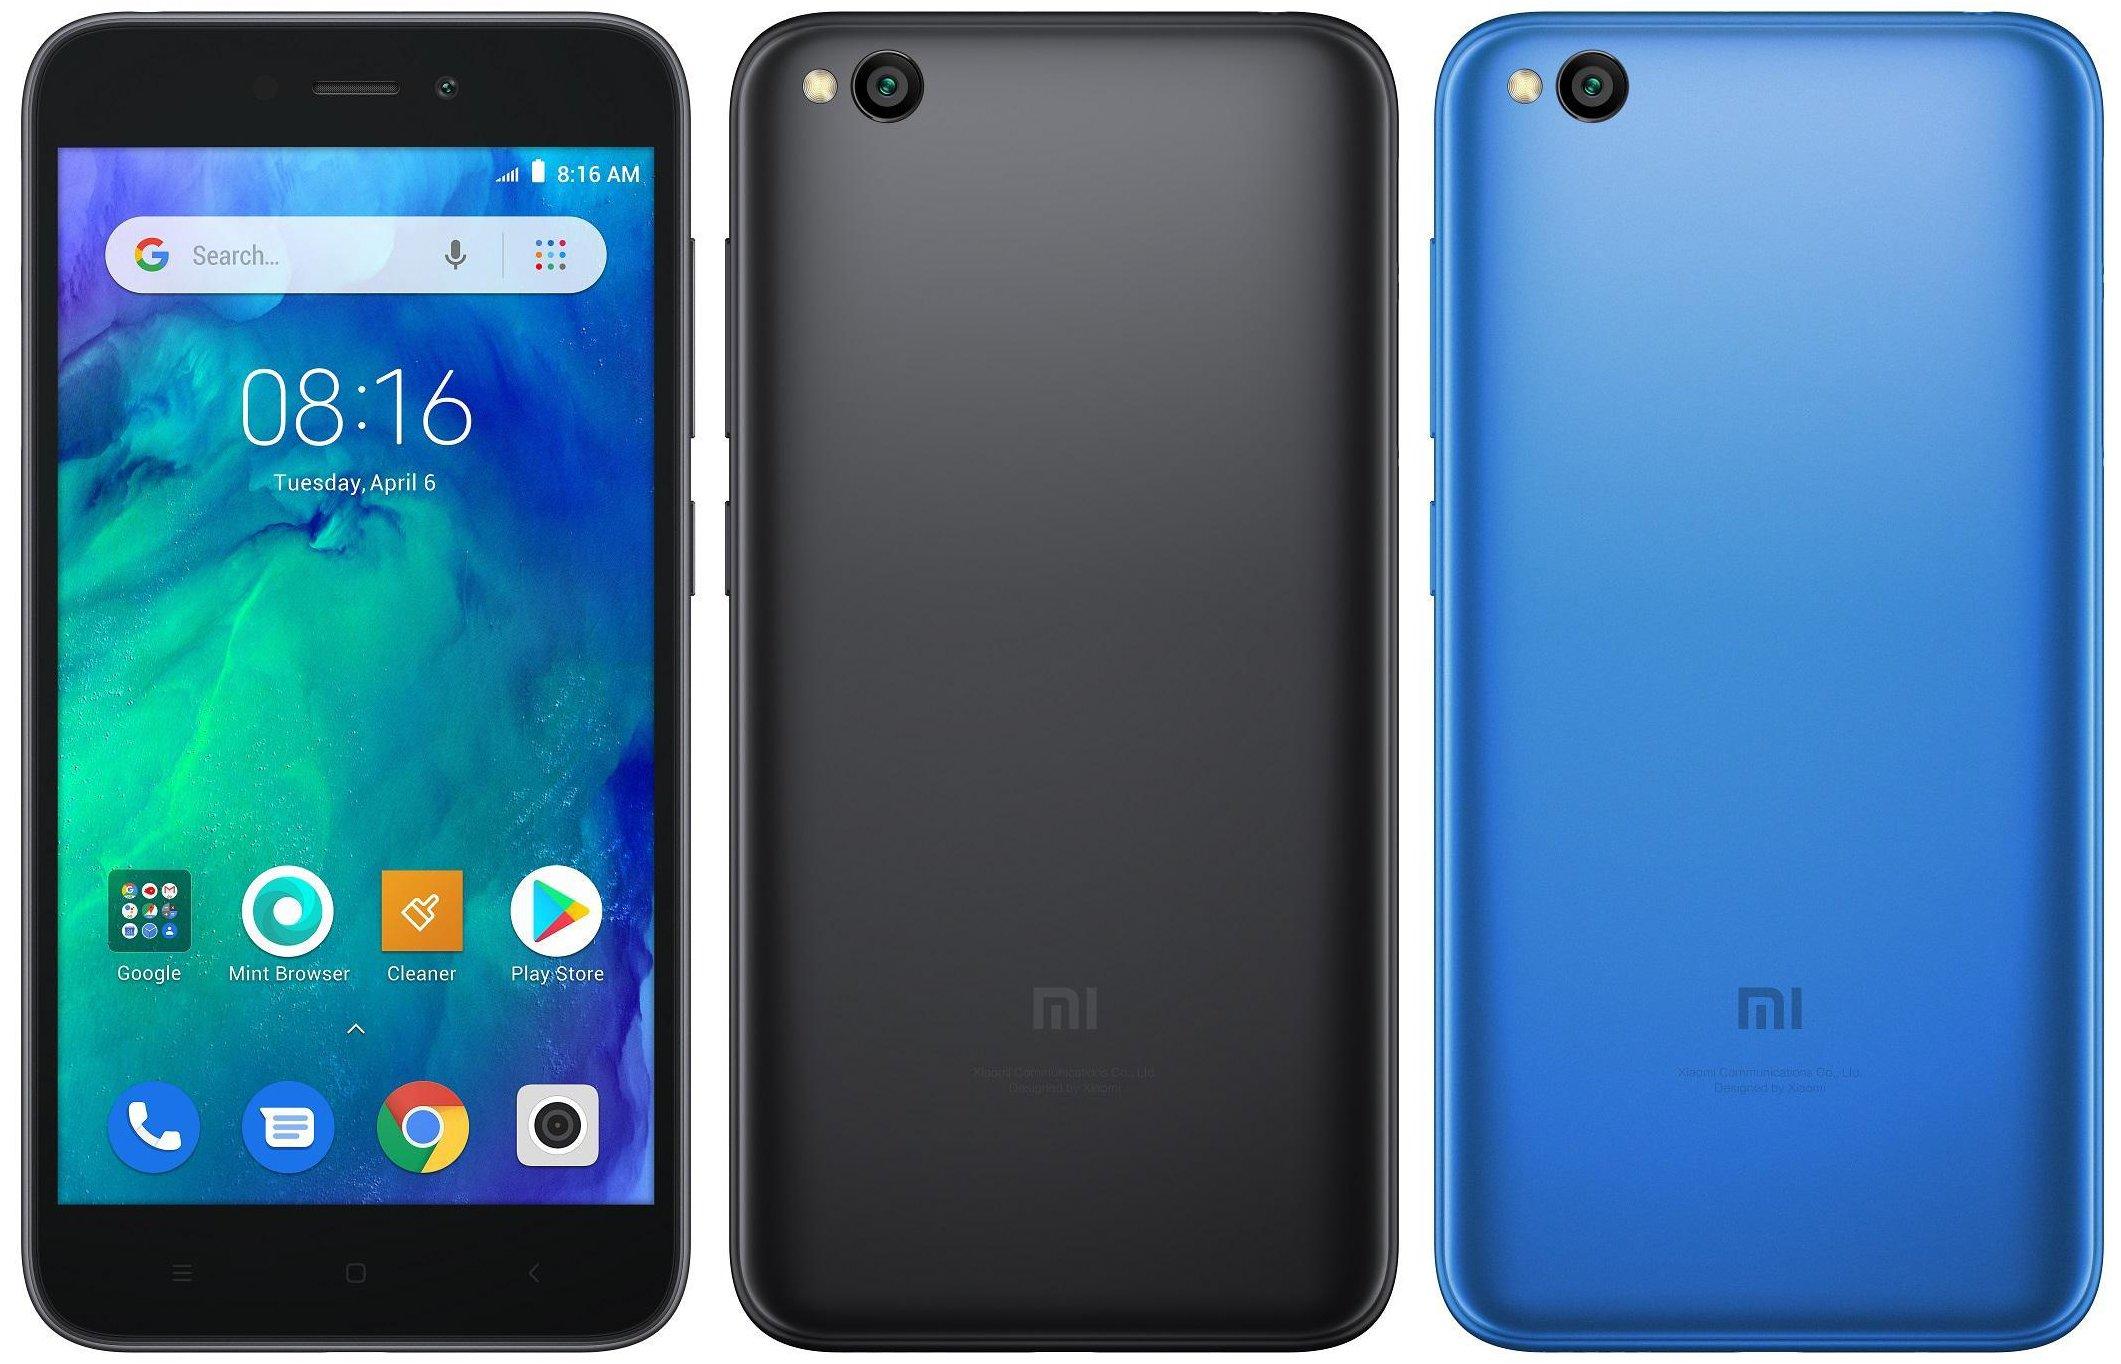 Xiaomi Redmi Go Format Atma Ve Sıfırlama